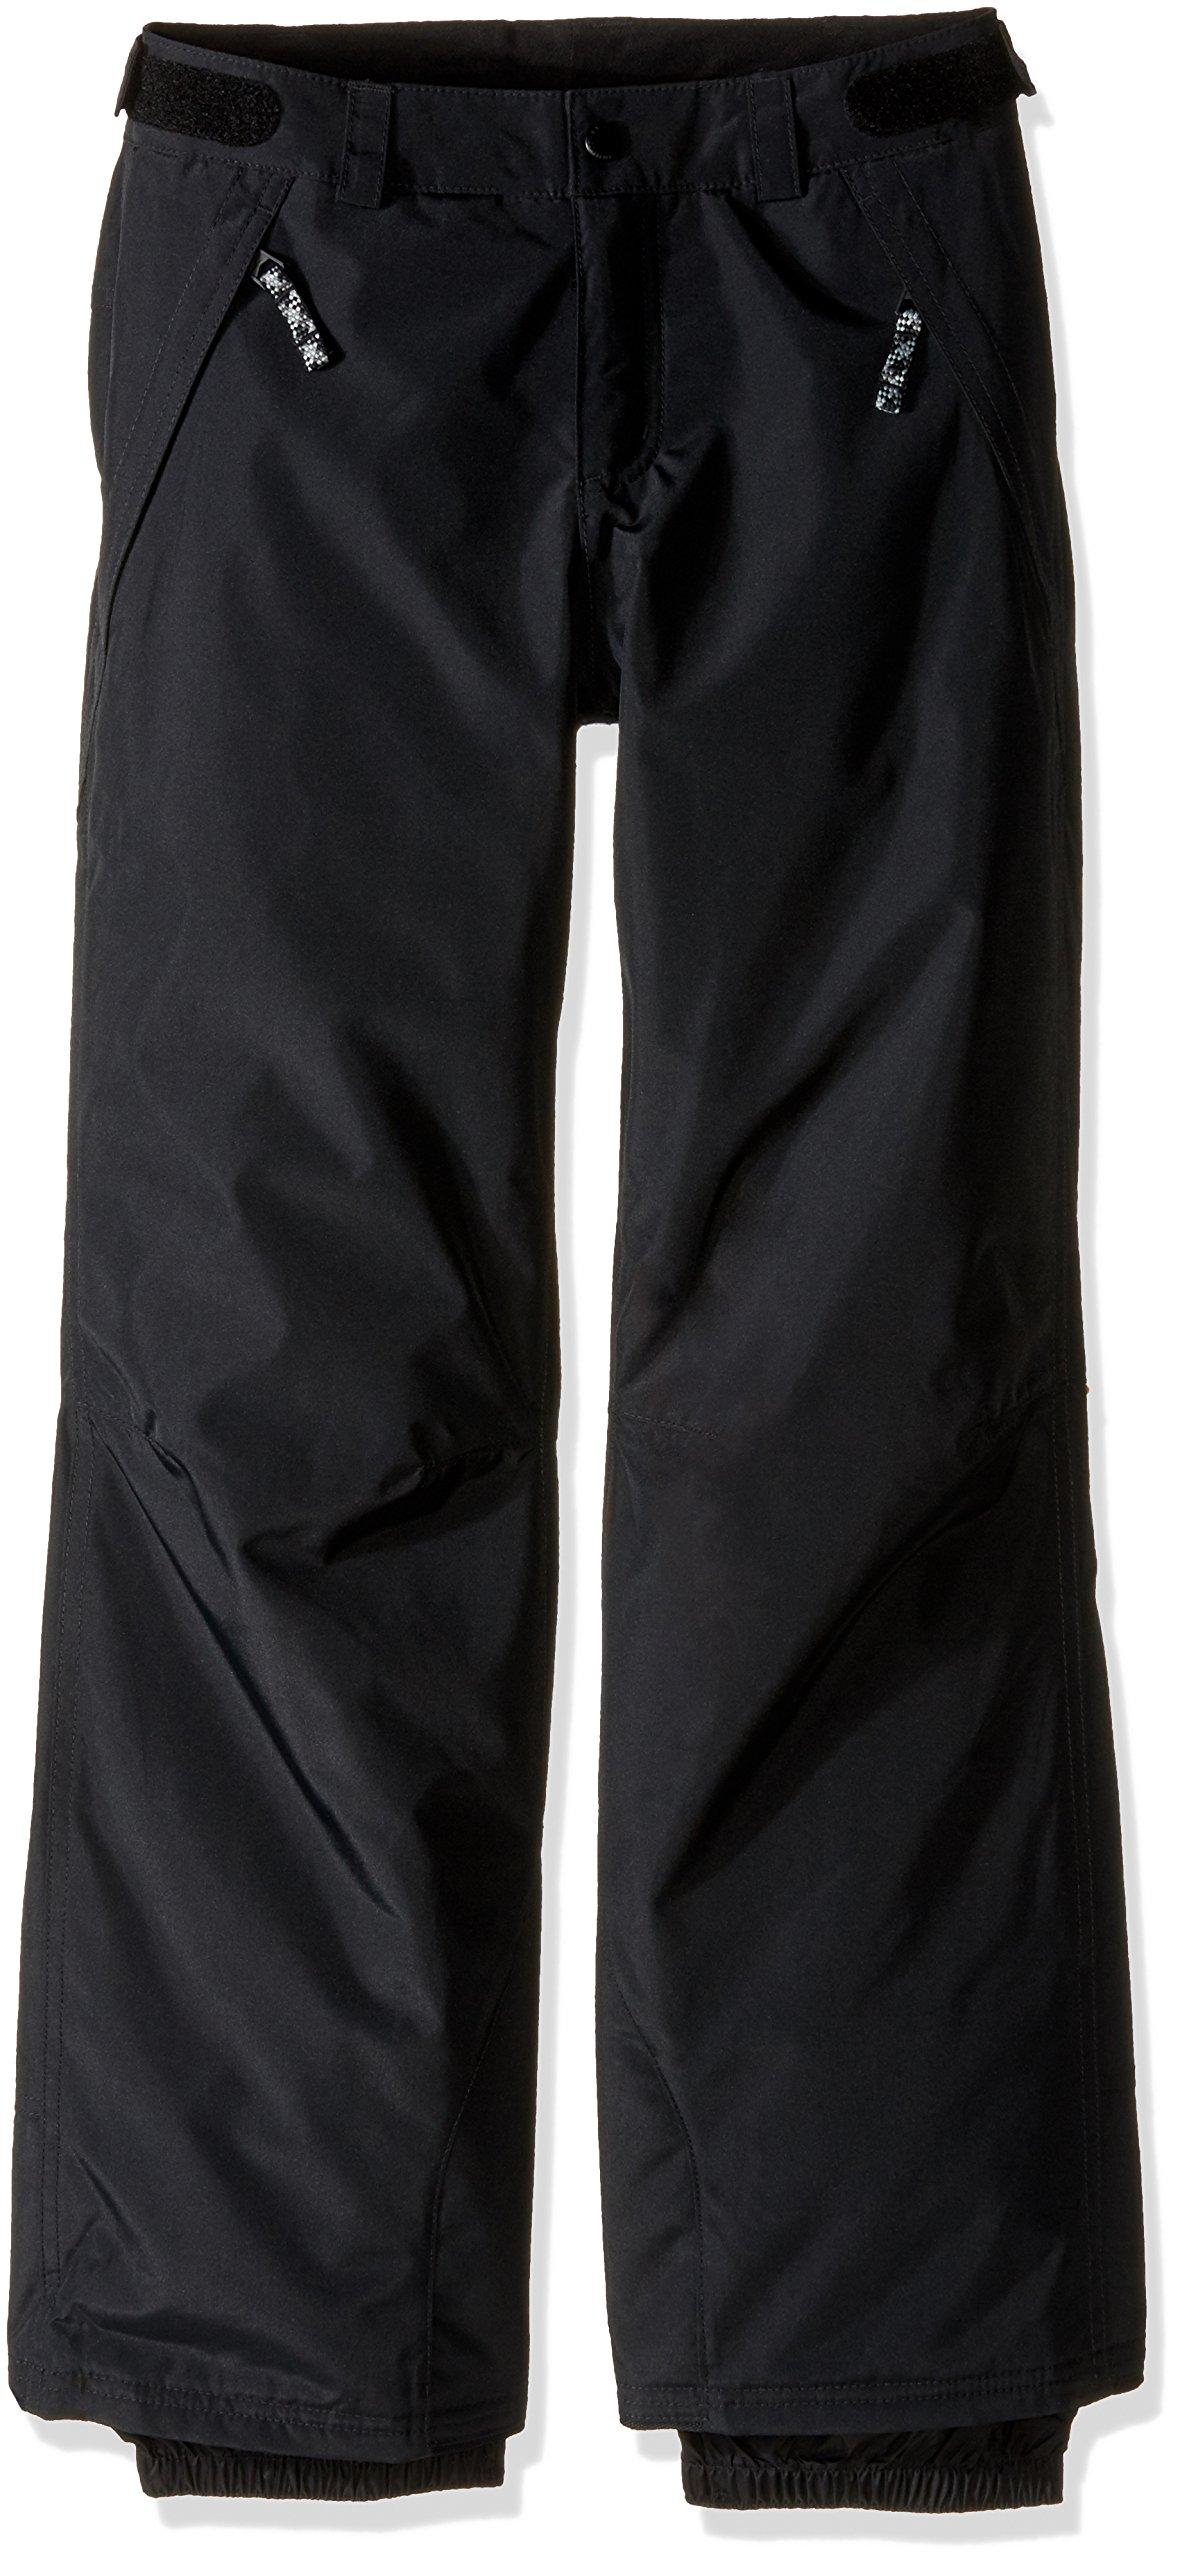 O'Neill Boys Anvil Pants, Black Out, Size 8